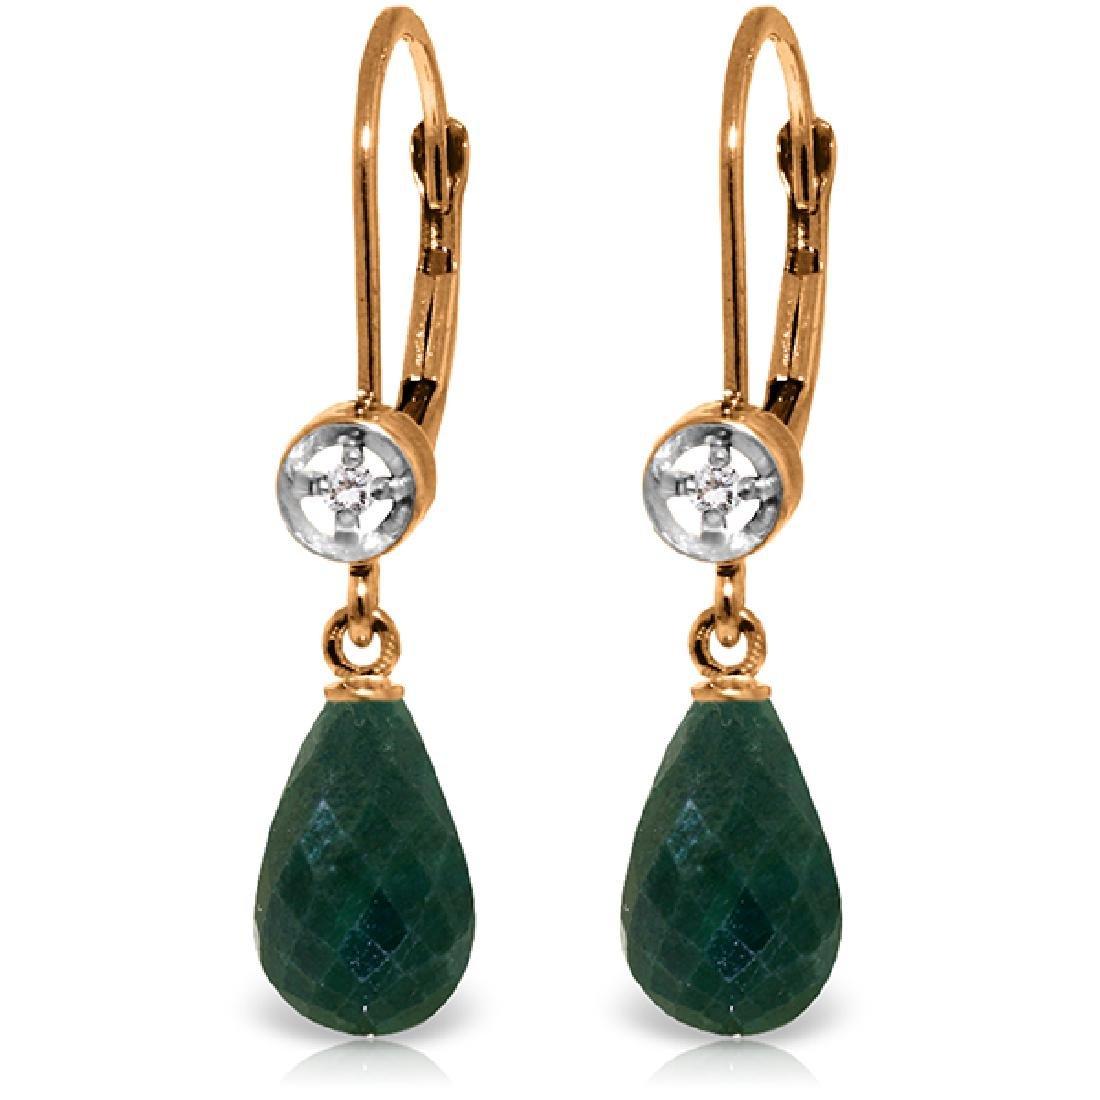 Genuine 6.63 ctw Green Sapphire Corundum & Diamond